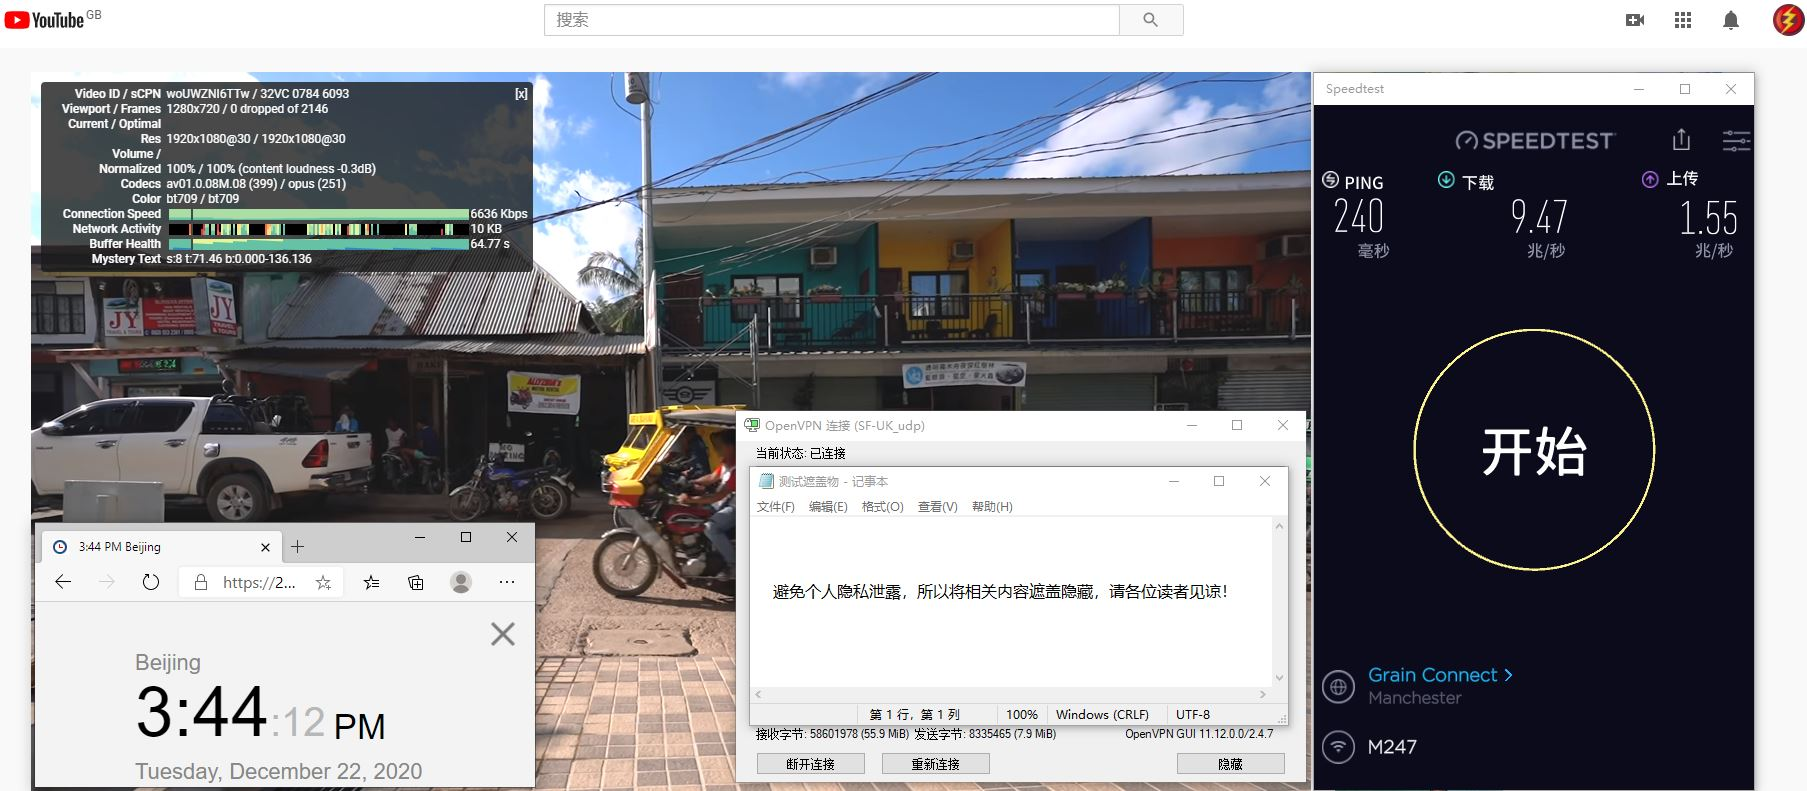 Windows10 SurfsharkVPN UK 服务器 中国VPN 翻墙 科学上网 测试 - 20201222